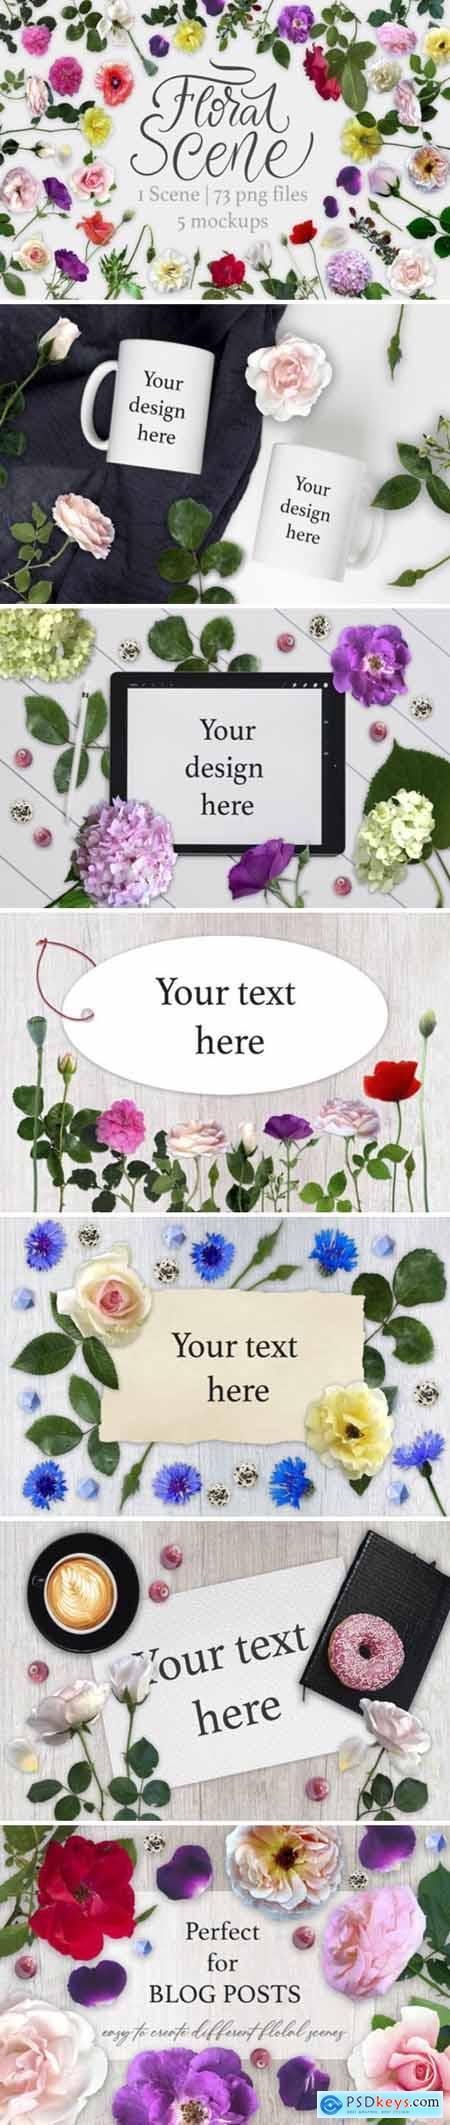 Floral Scene Creator + 5 Mock Ups